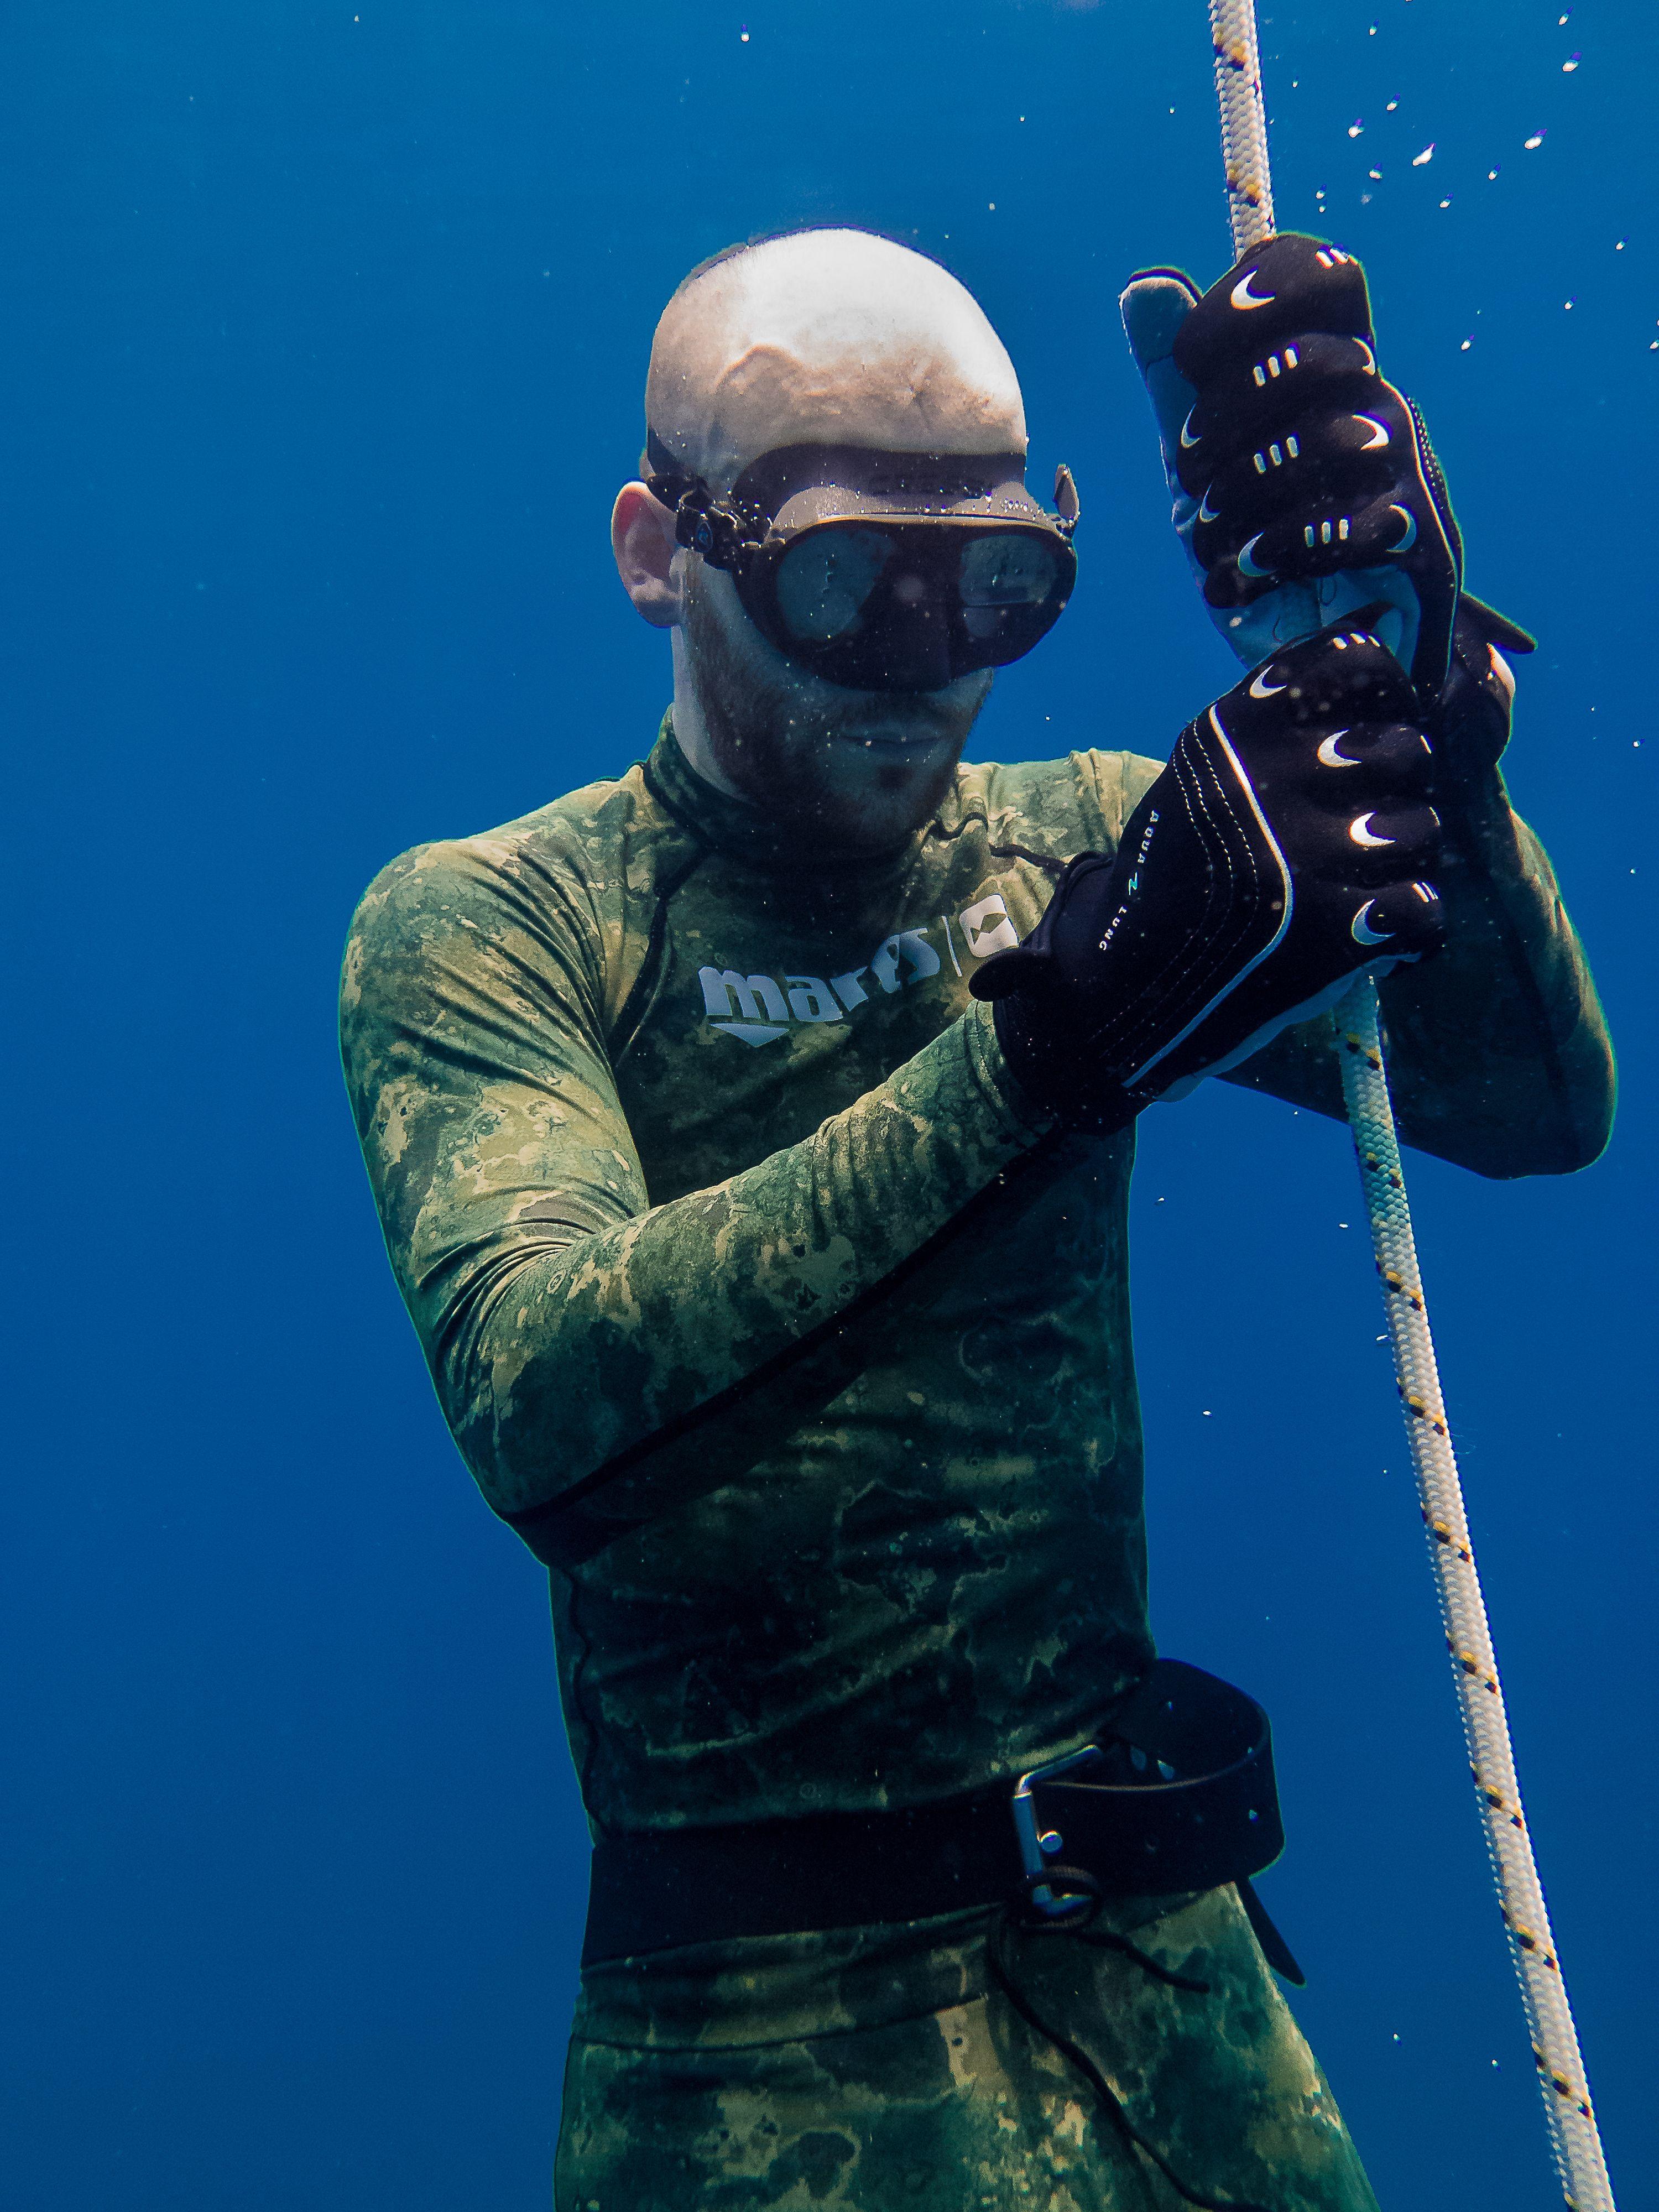 Under WATER 🐠🐟🌊 . . . .Follow Us 👉 @apnea.pirates